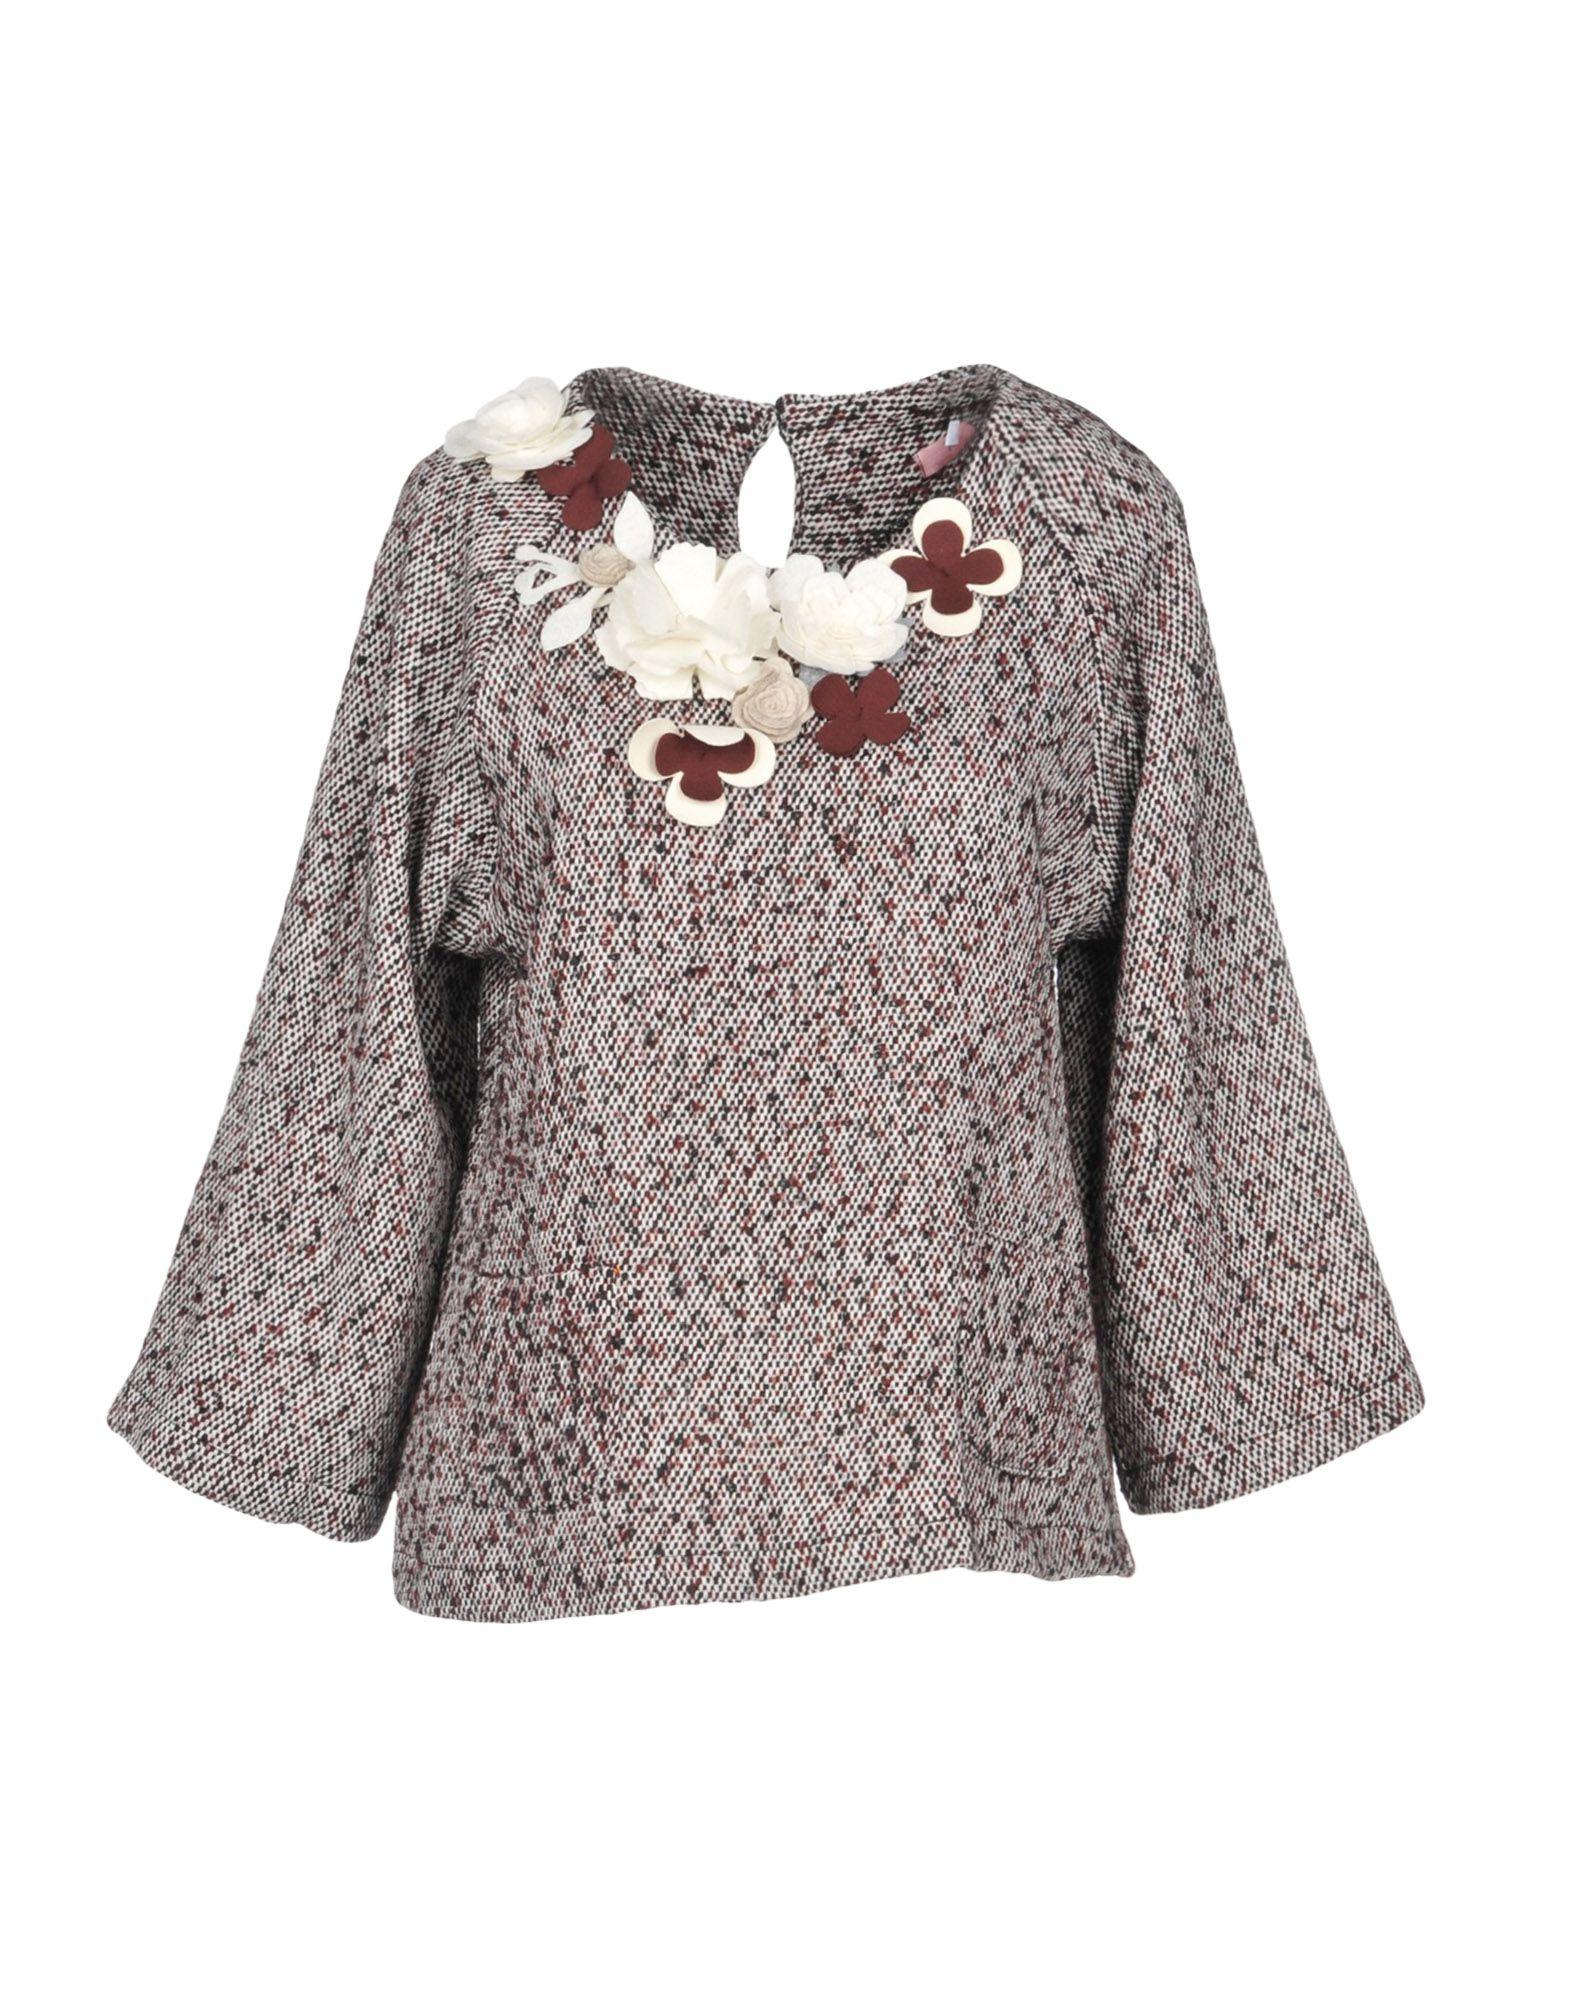 ROSE' A POIS Блузка rose a pois юбка длиной 3 4